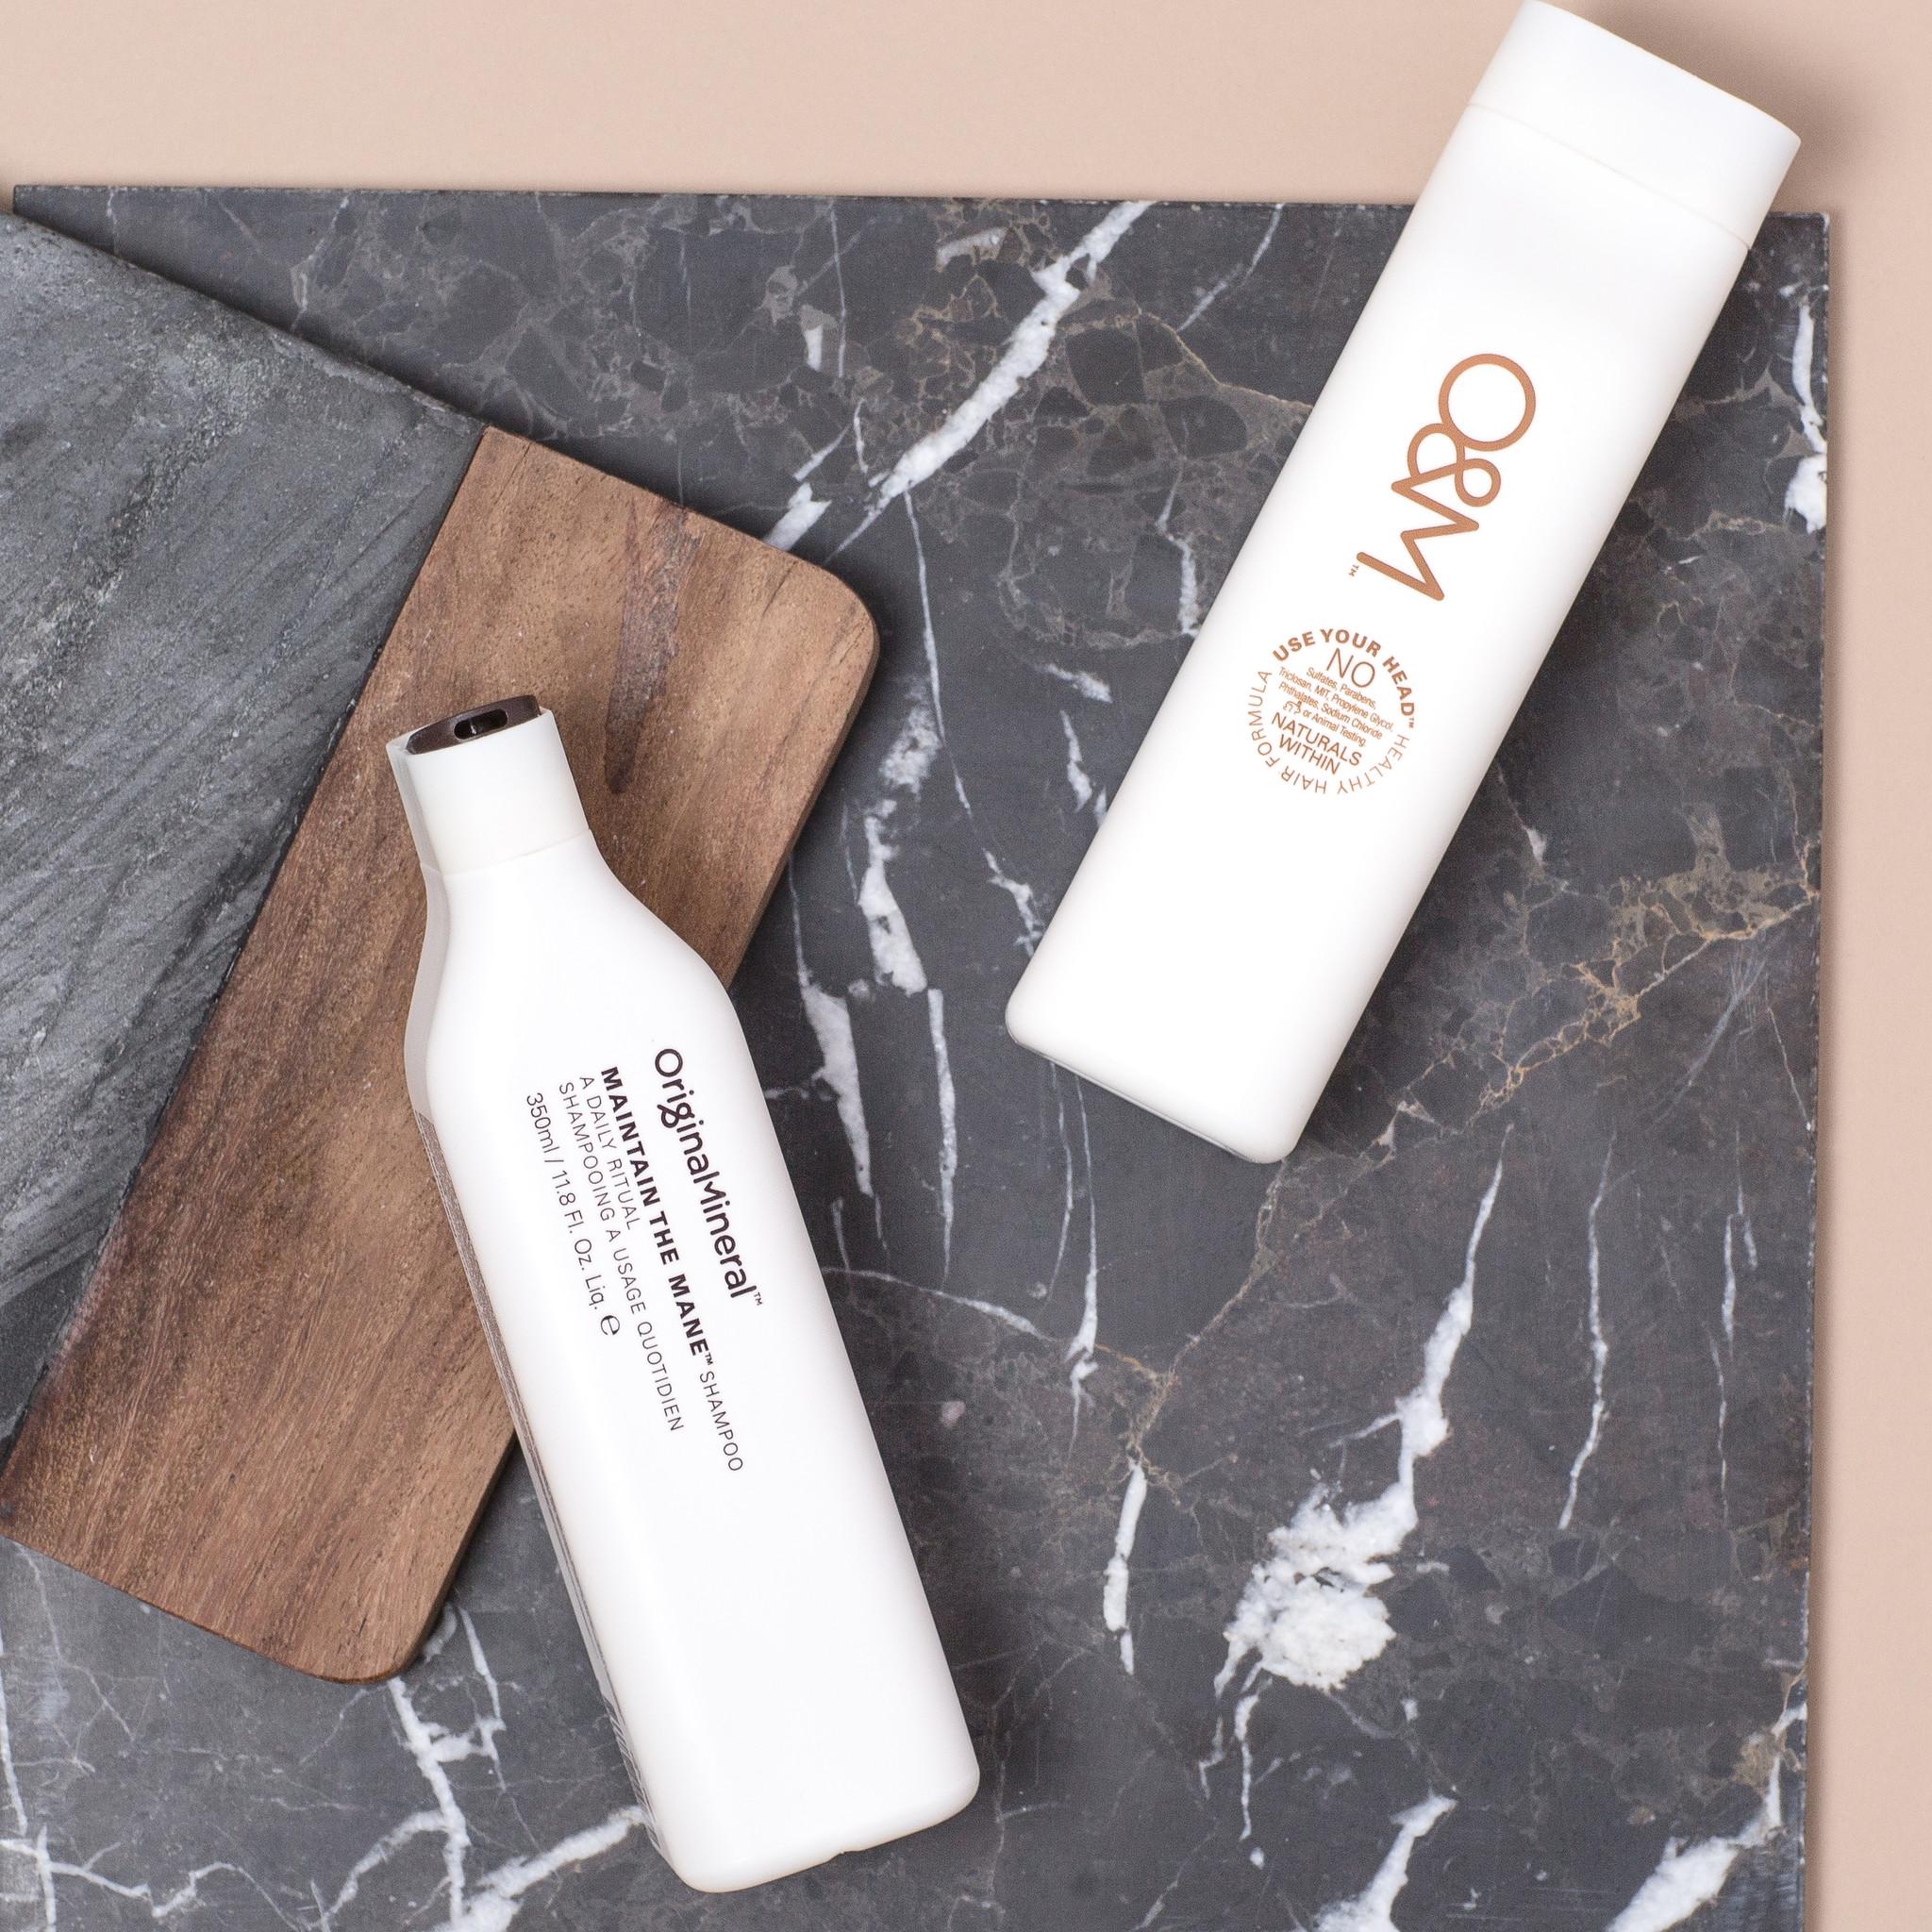 O&M - Original Mineral O&M Maintain The Mane Après Shampooing Quotidien d'entretien - 350ml